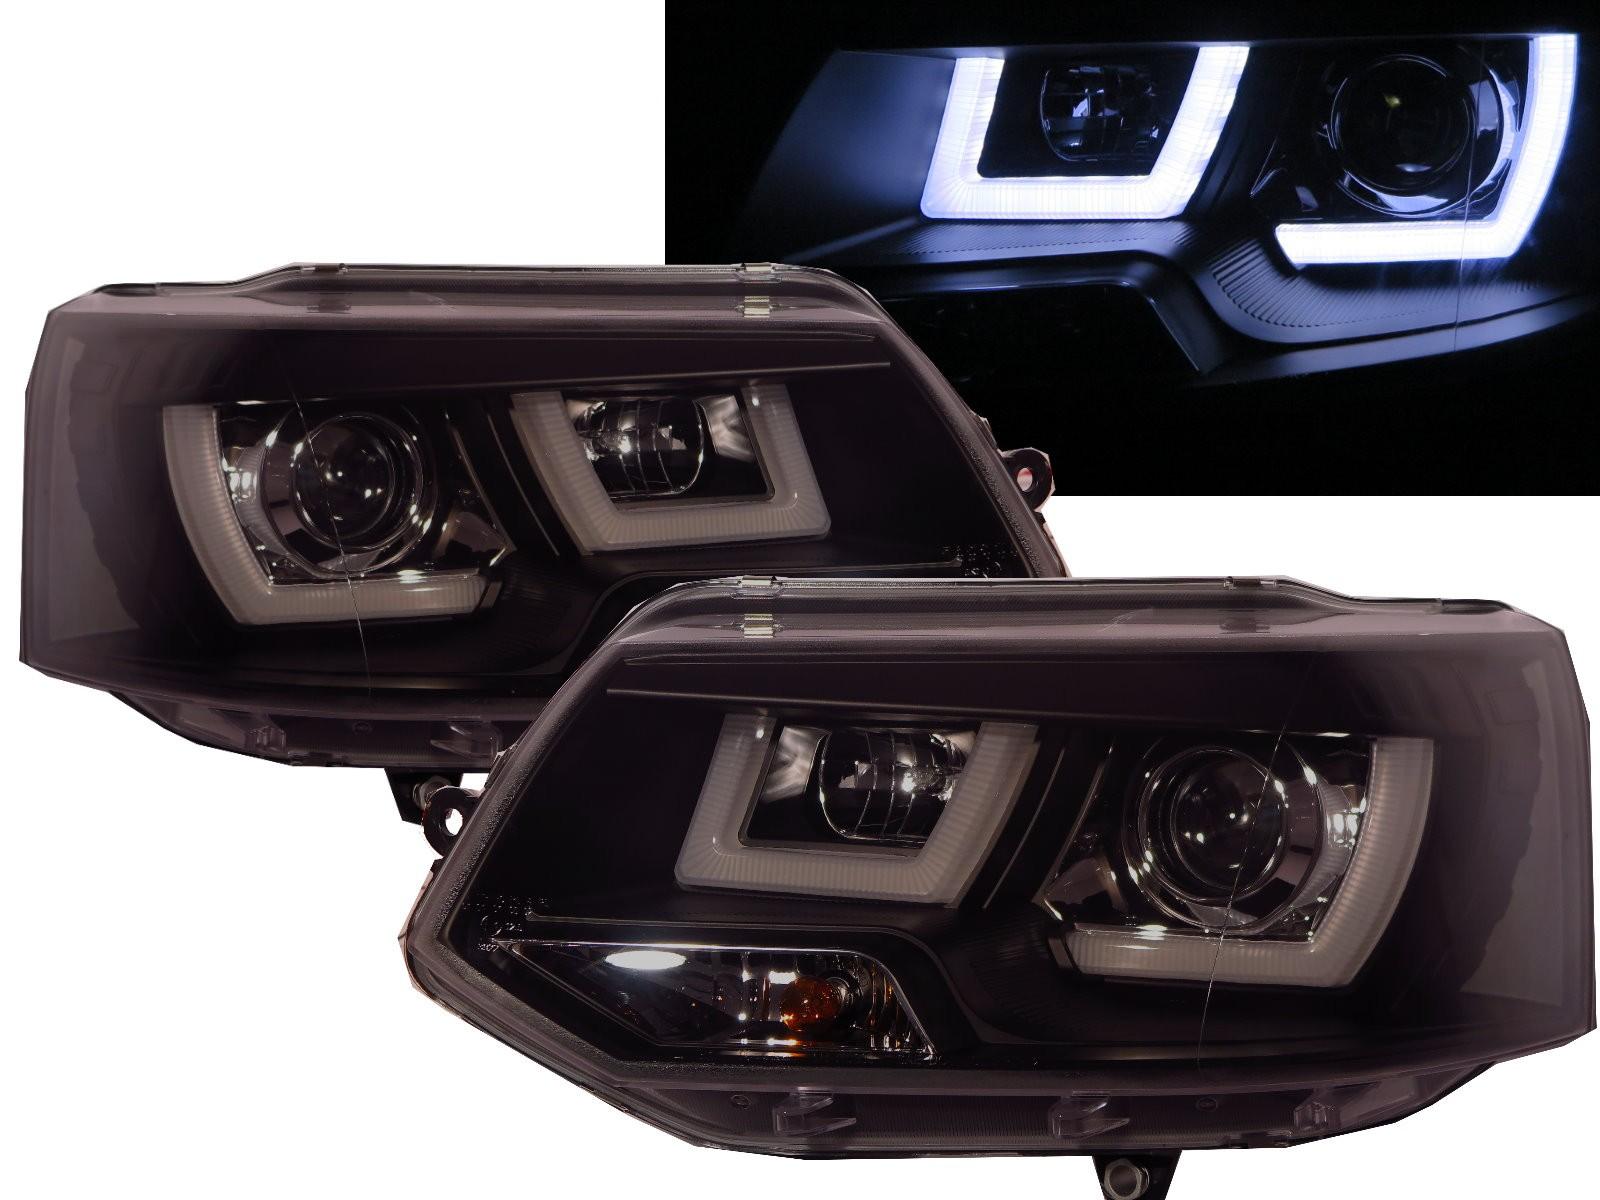 CrazyTheGod Multivan T5 Fifth generation 2011-2015 FACELIFT SUV 5D 3D LED Bar DRL Projector Headlight Headlamp Black for VW Volkswagen RHD